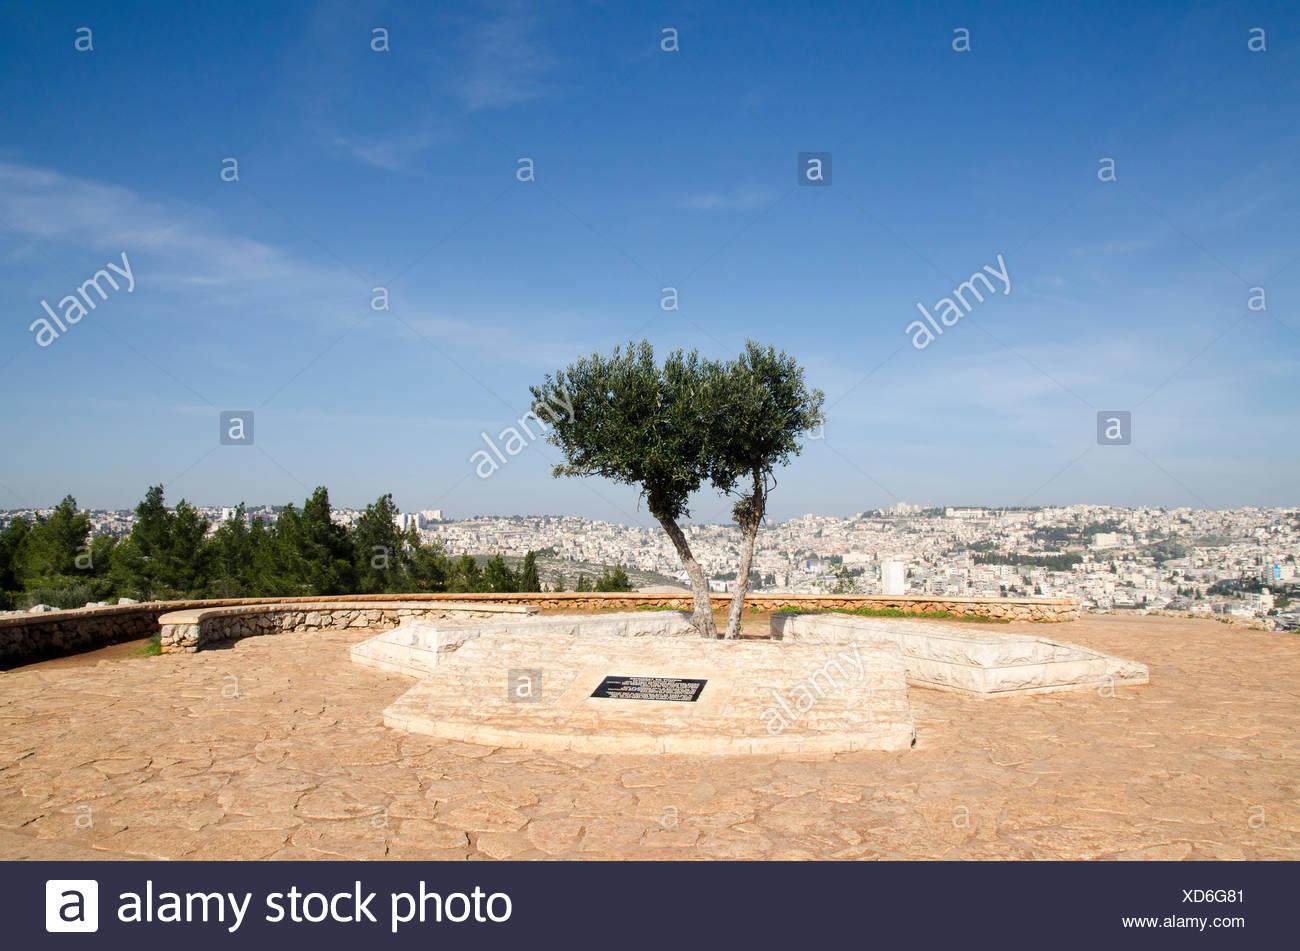 Israel, Lower Galilee, Mount Precipice overlooking Nazareth Stock Photo